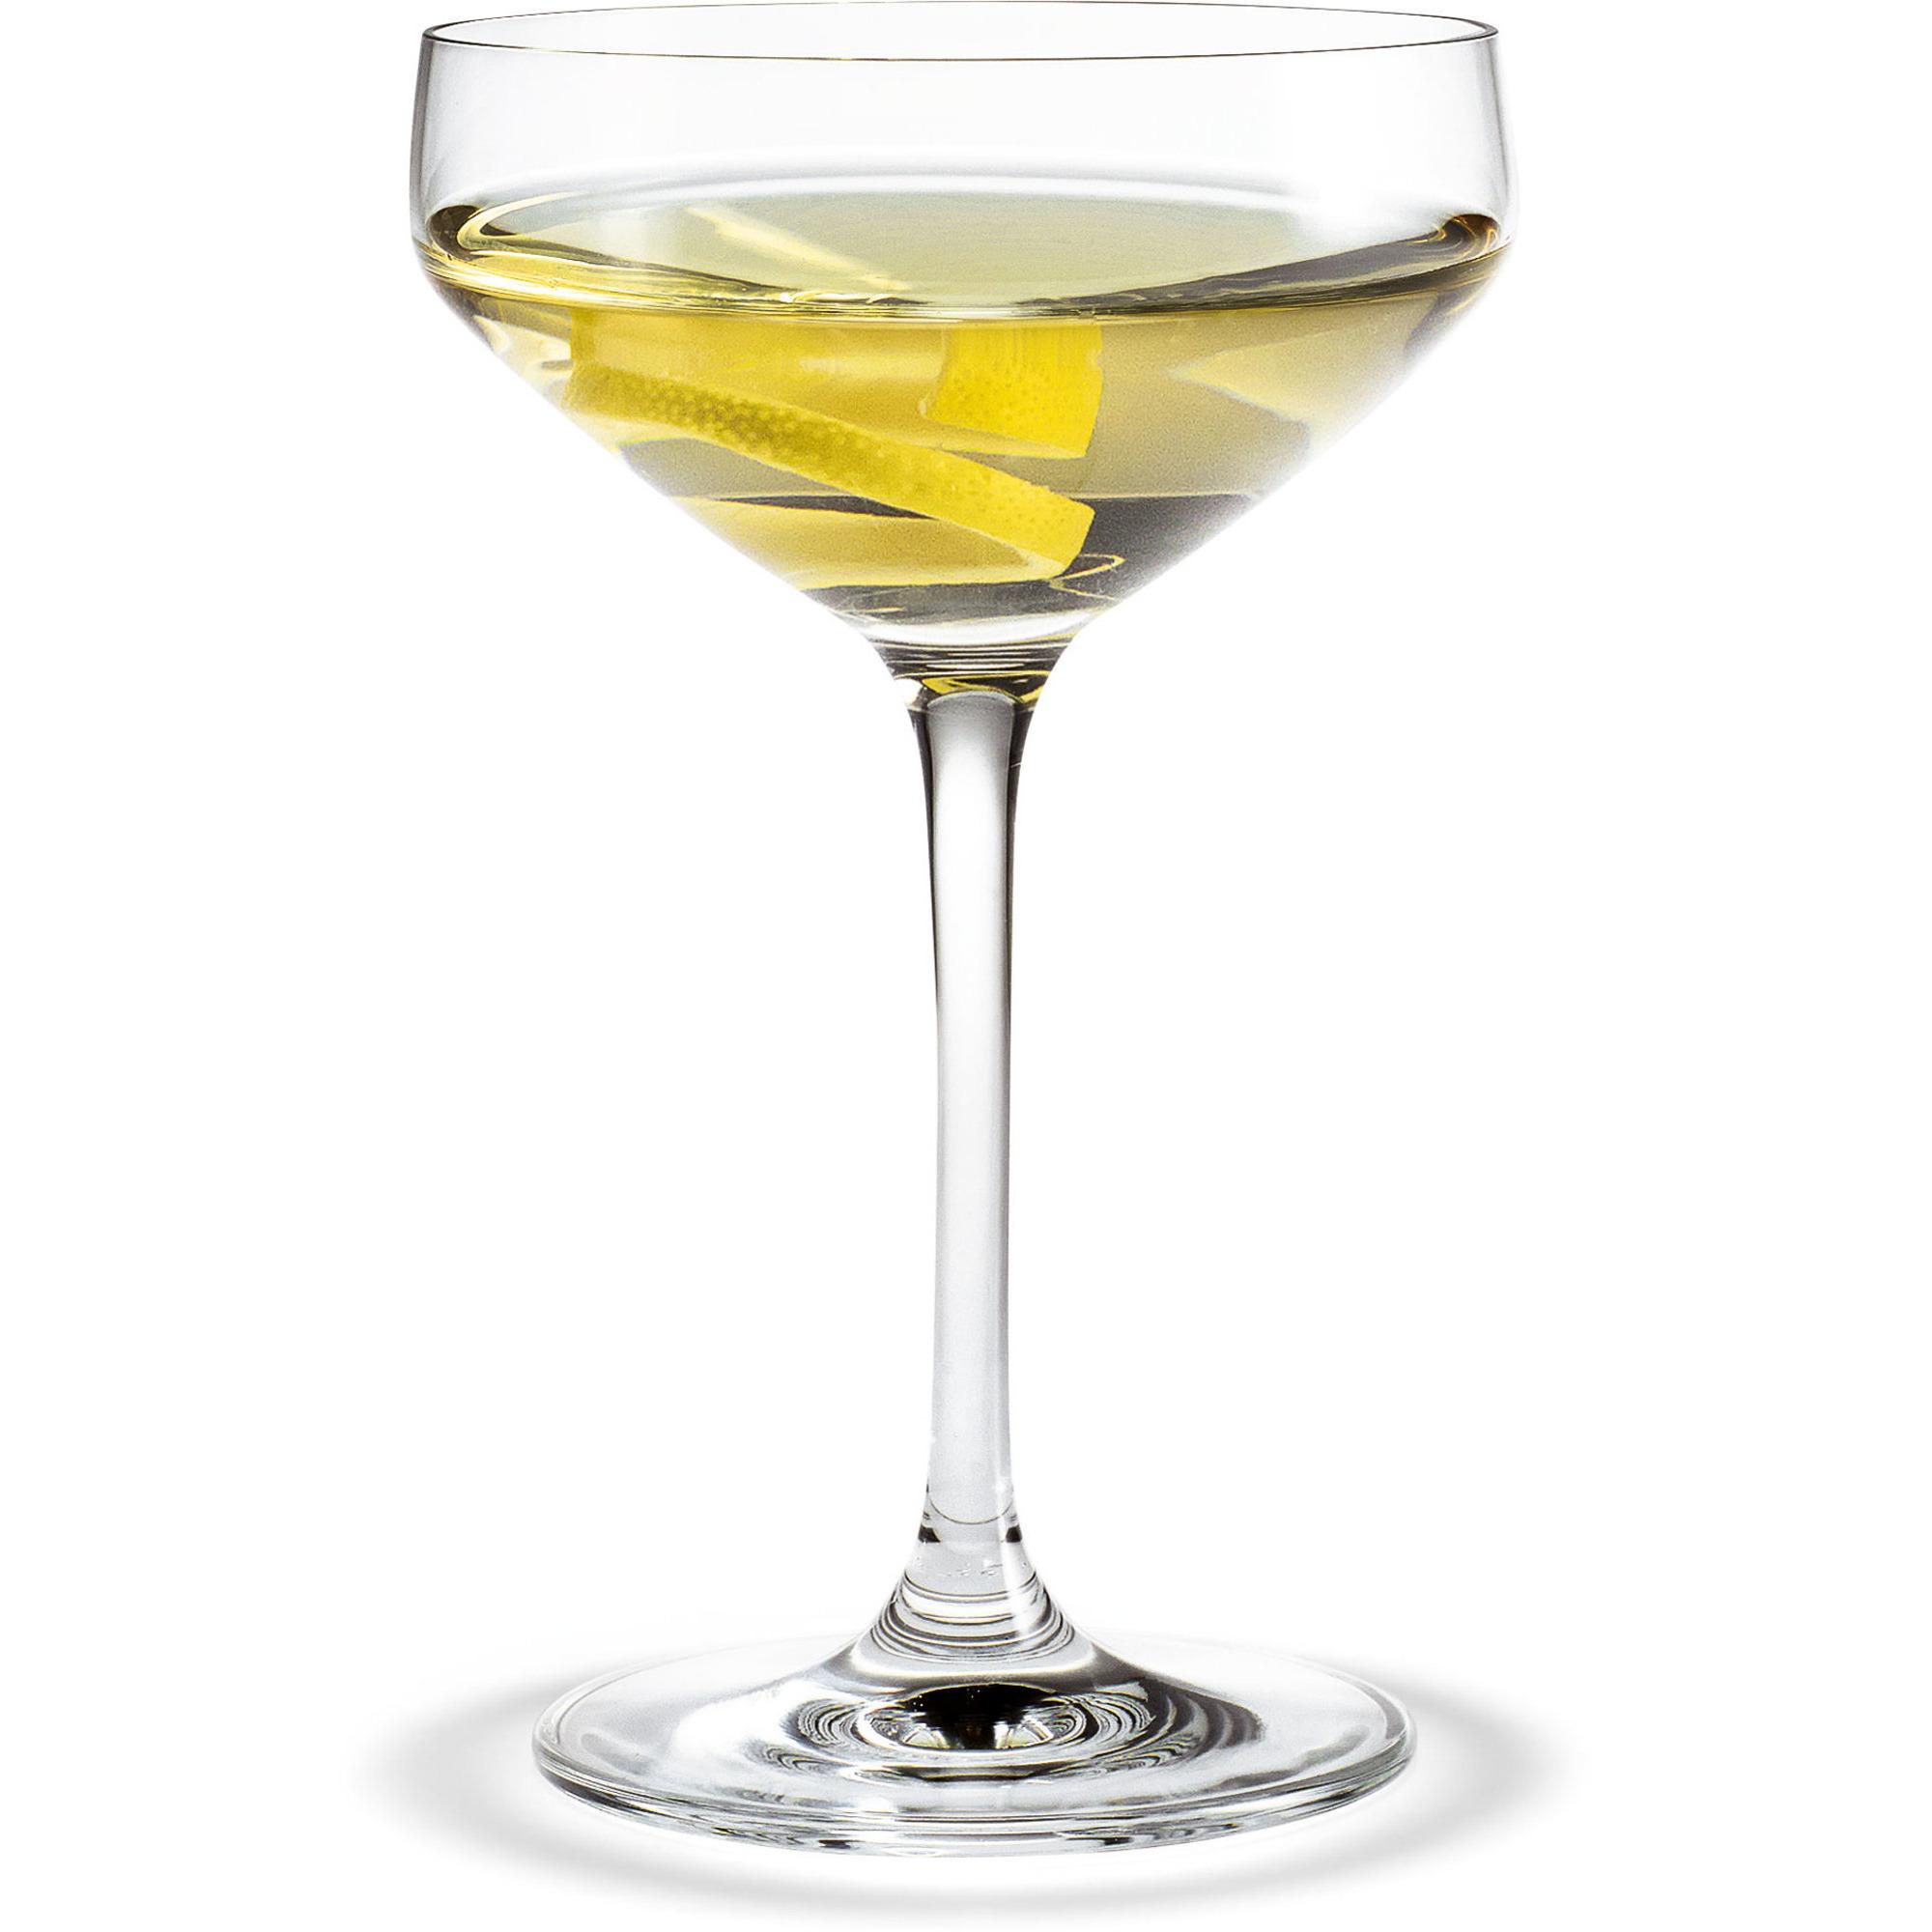 Holmegaard Perfection martiniglas